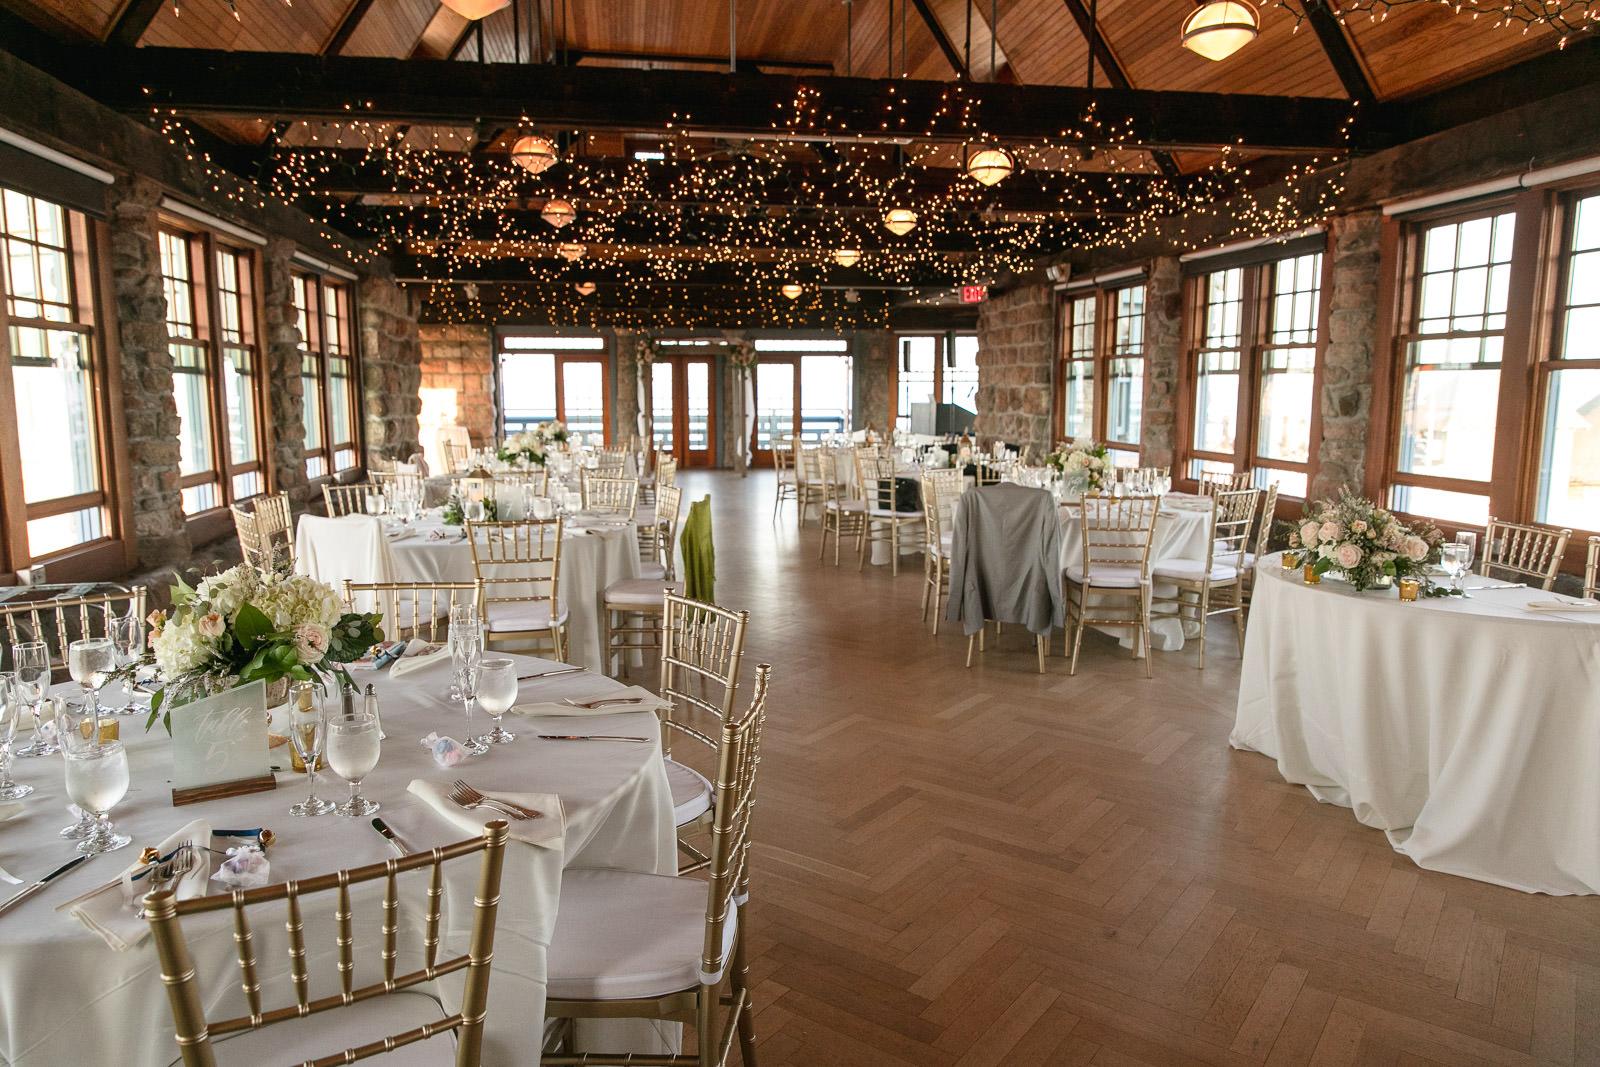 Wedding, Narragansett Towers, The Towers, Narragansett, Rhode Island, RI, Tracy Jenkins photography, RI wedding photographer, Rhode Island wedding photographer, wedding reception, twinkle lights